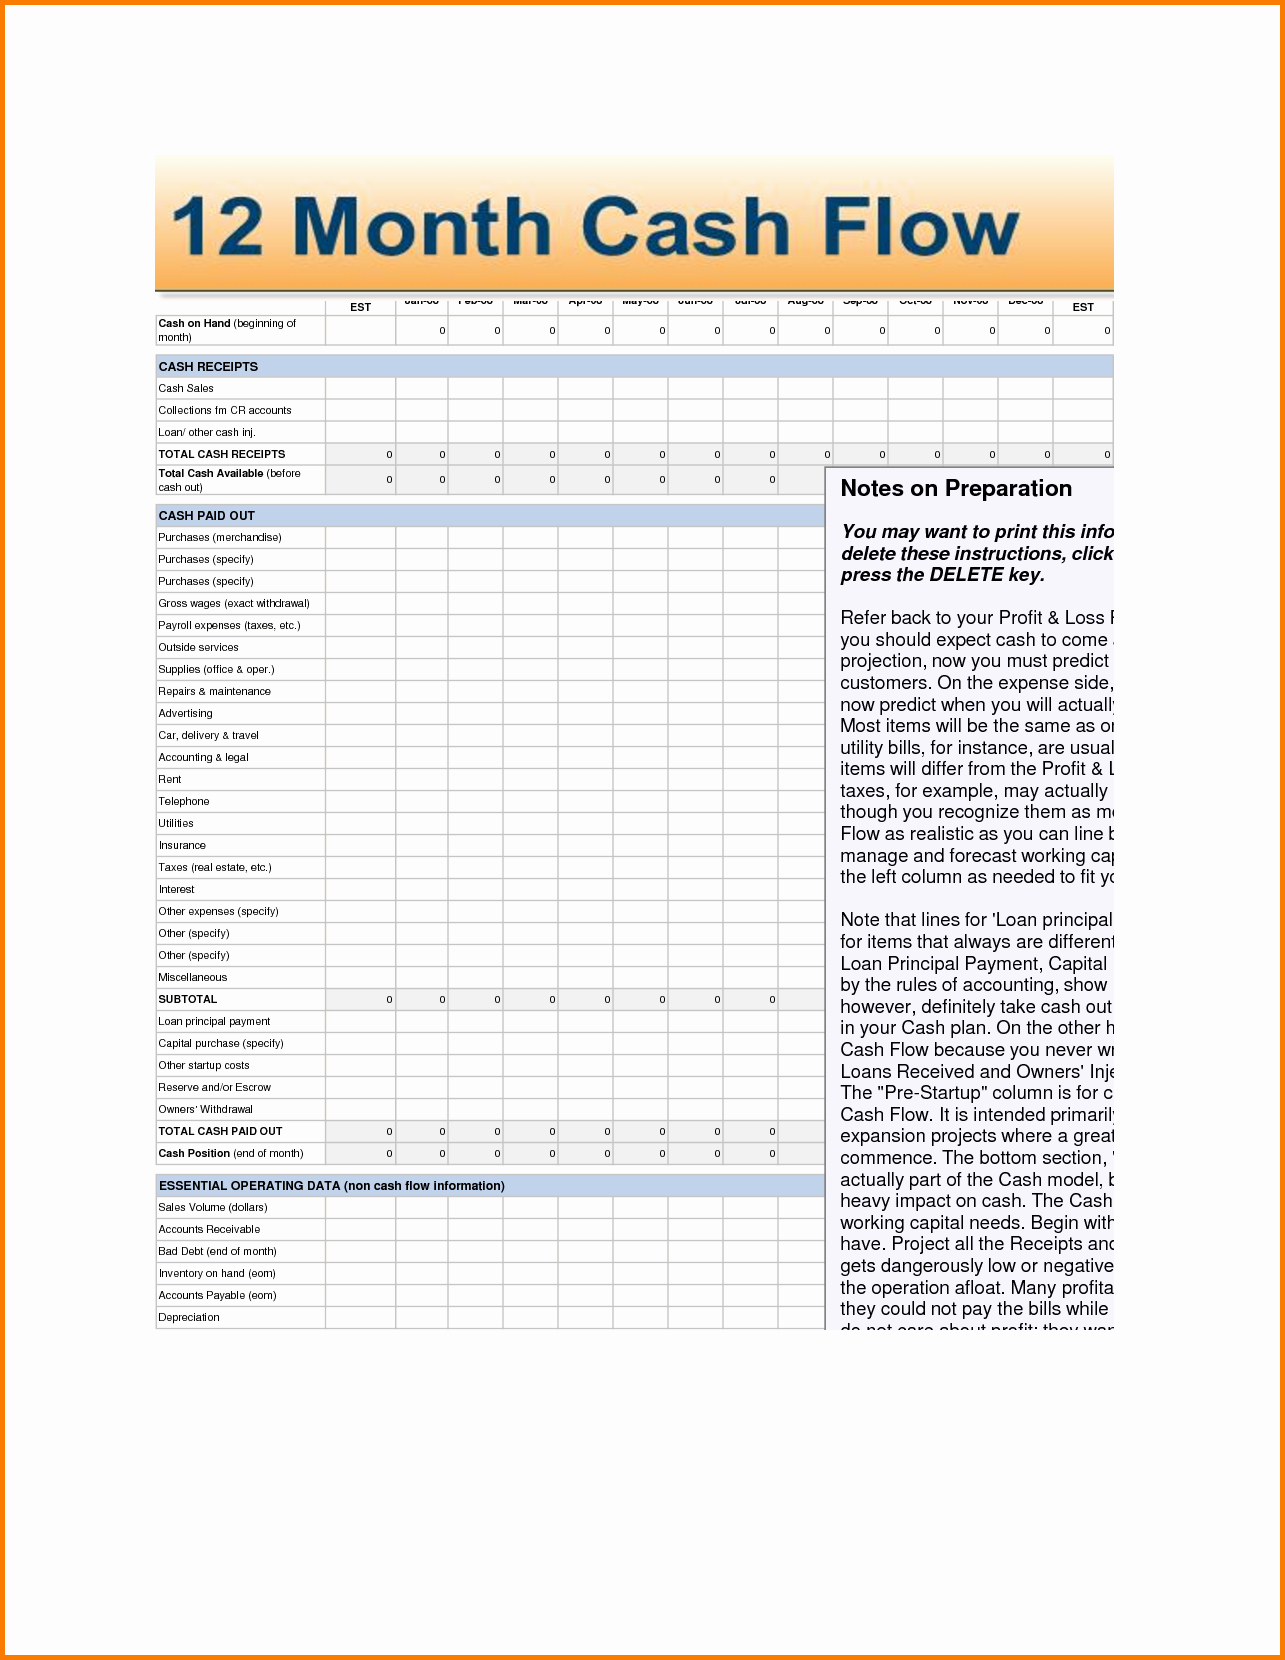 Cash Flow Budget Template Excel Best Of Cash Bud Template